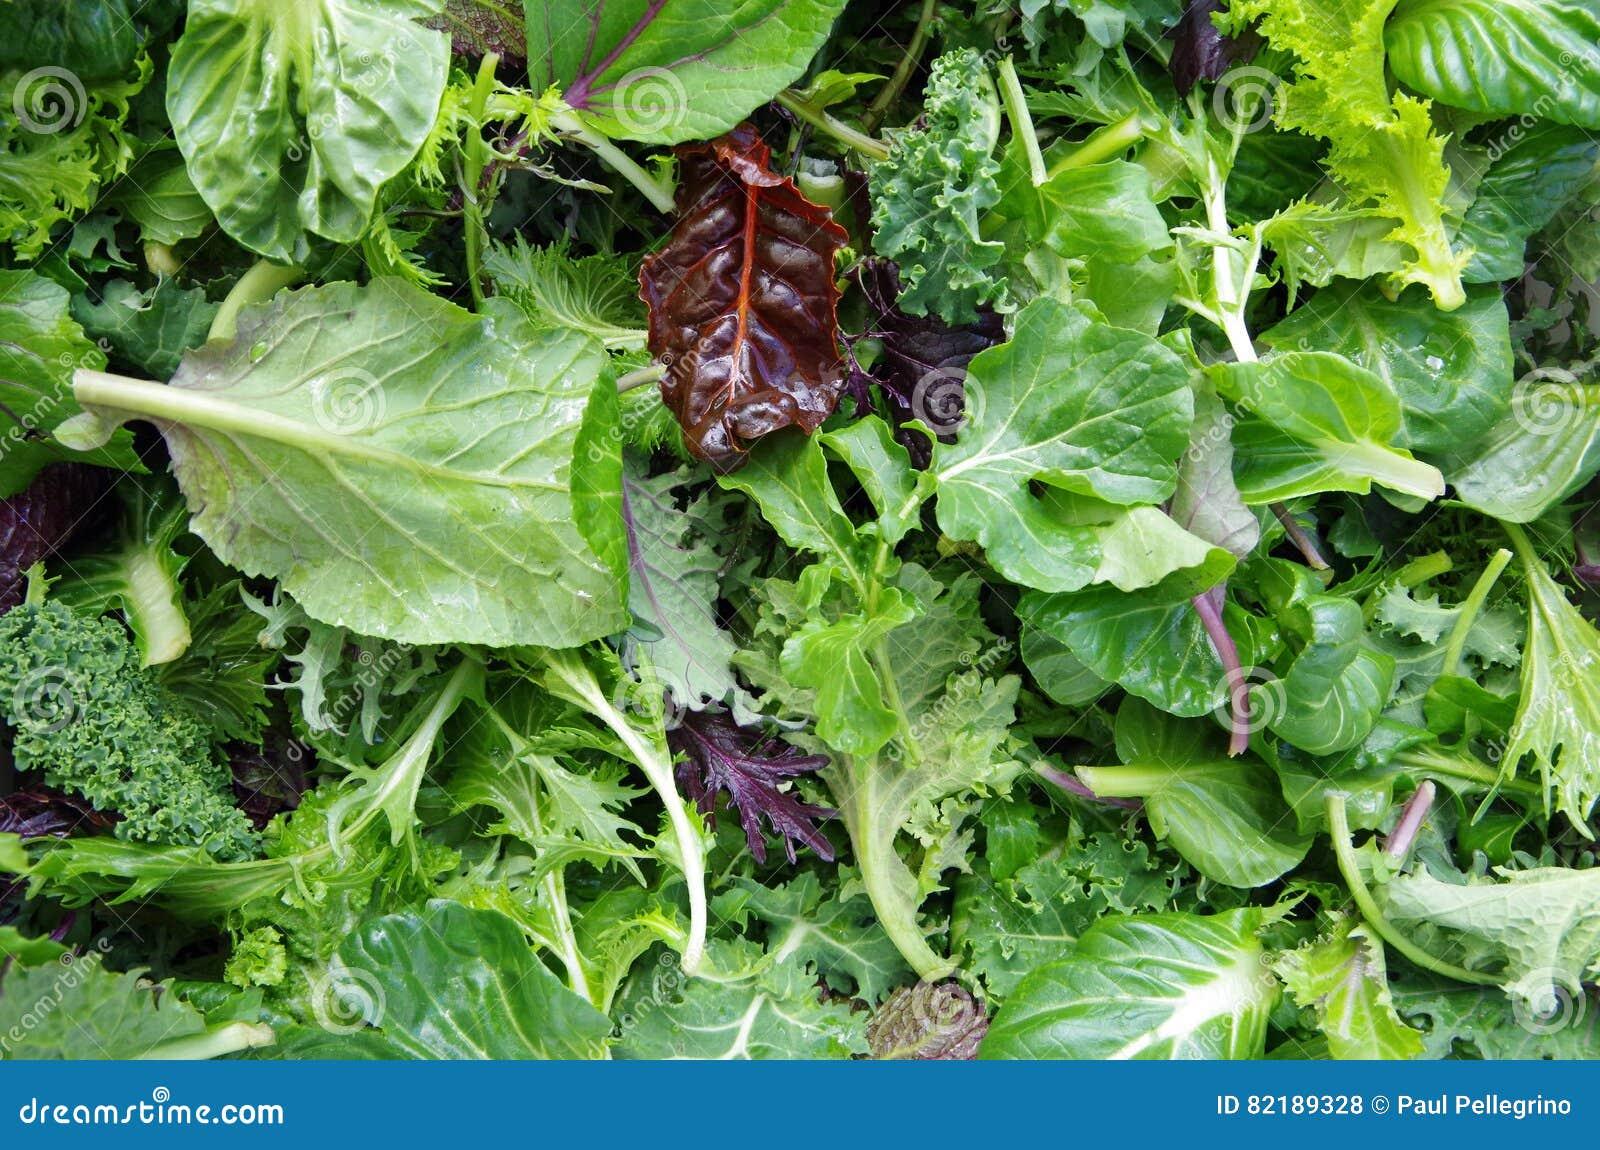 Verts de gisement de salade mixte